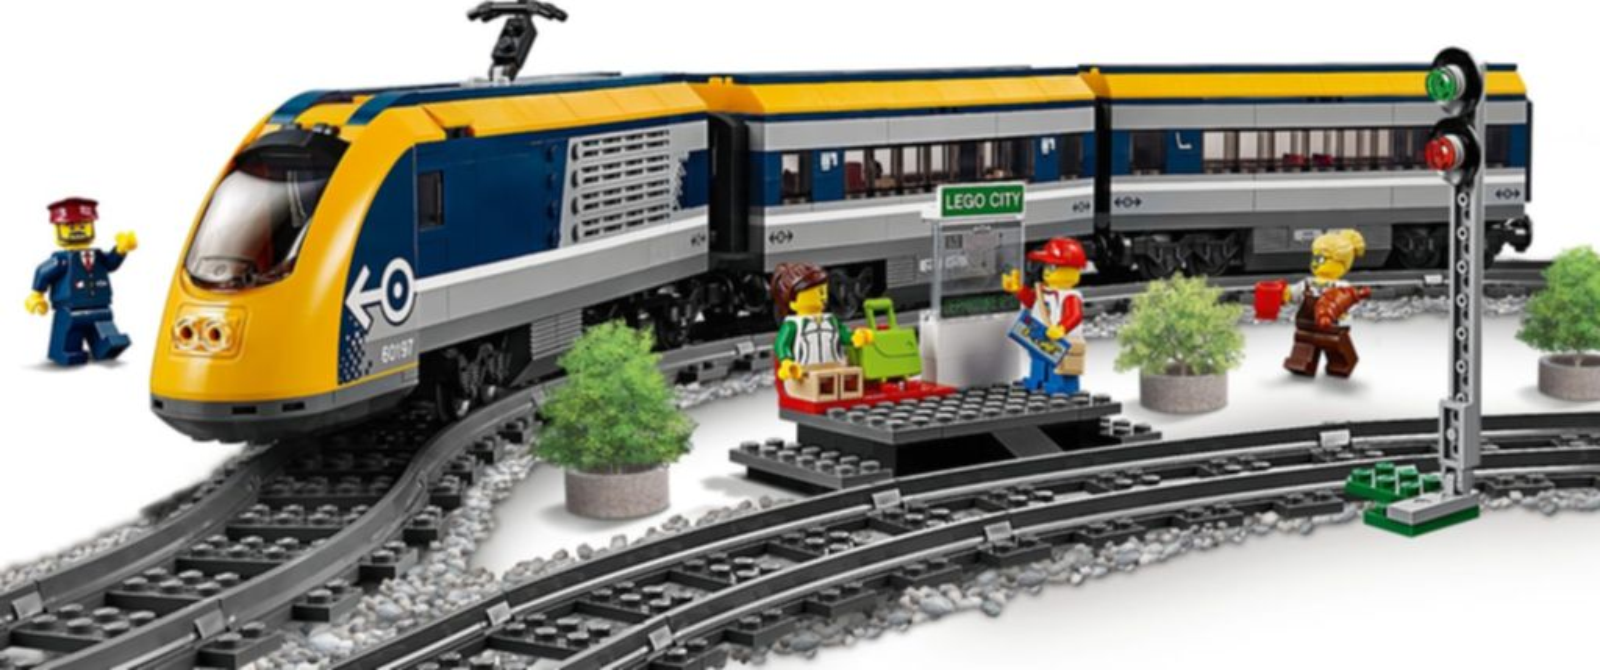 LEGO® City Passenger Train gameplay